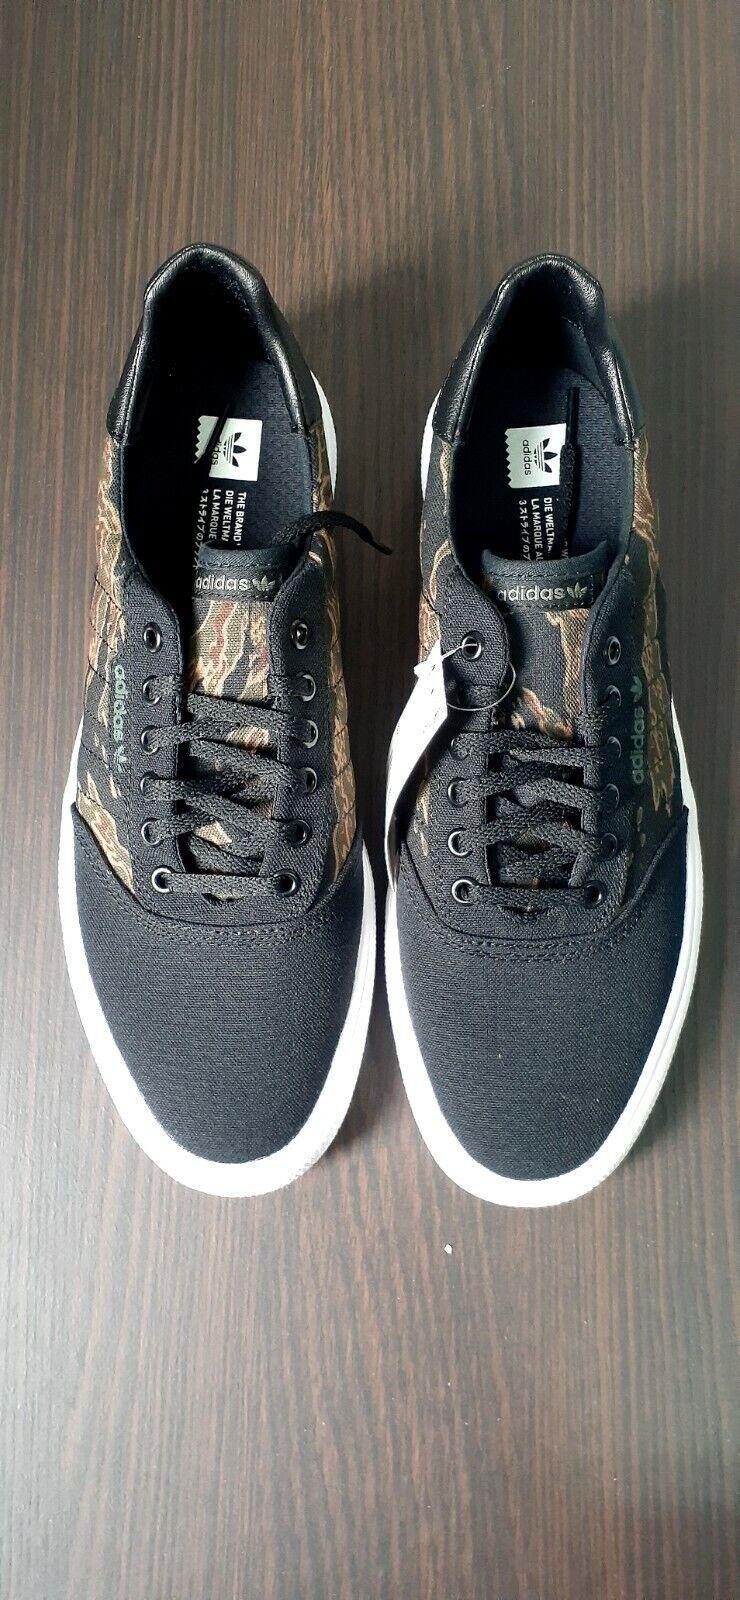 Adidas 3MC Vulc Skateboard Shoe - Black/Brown/Camo